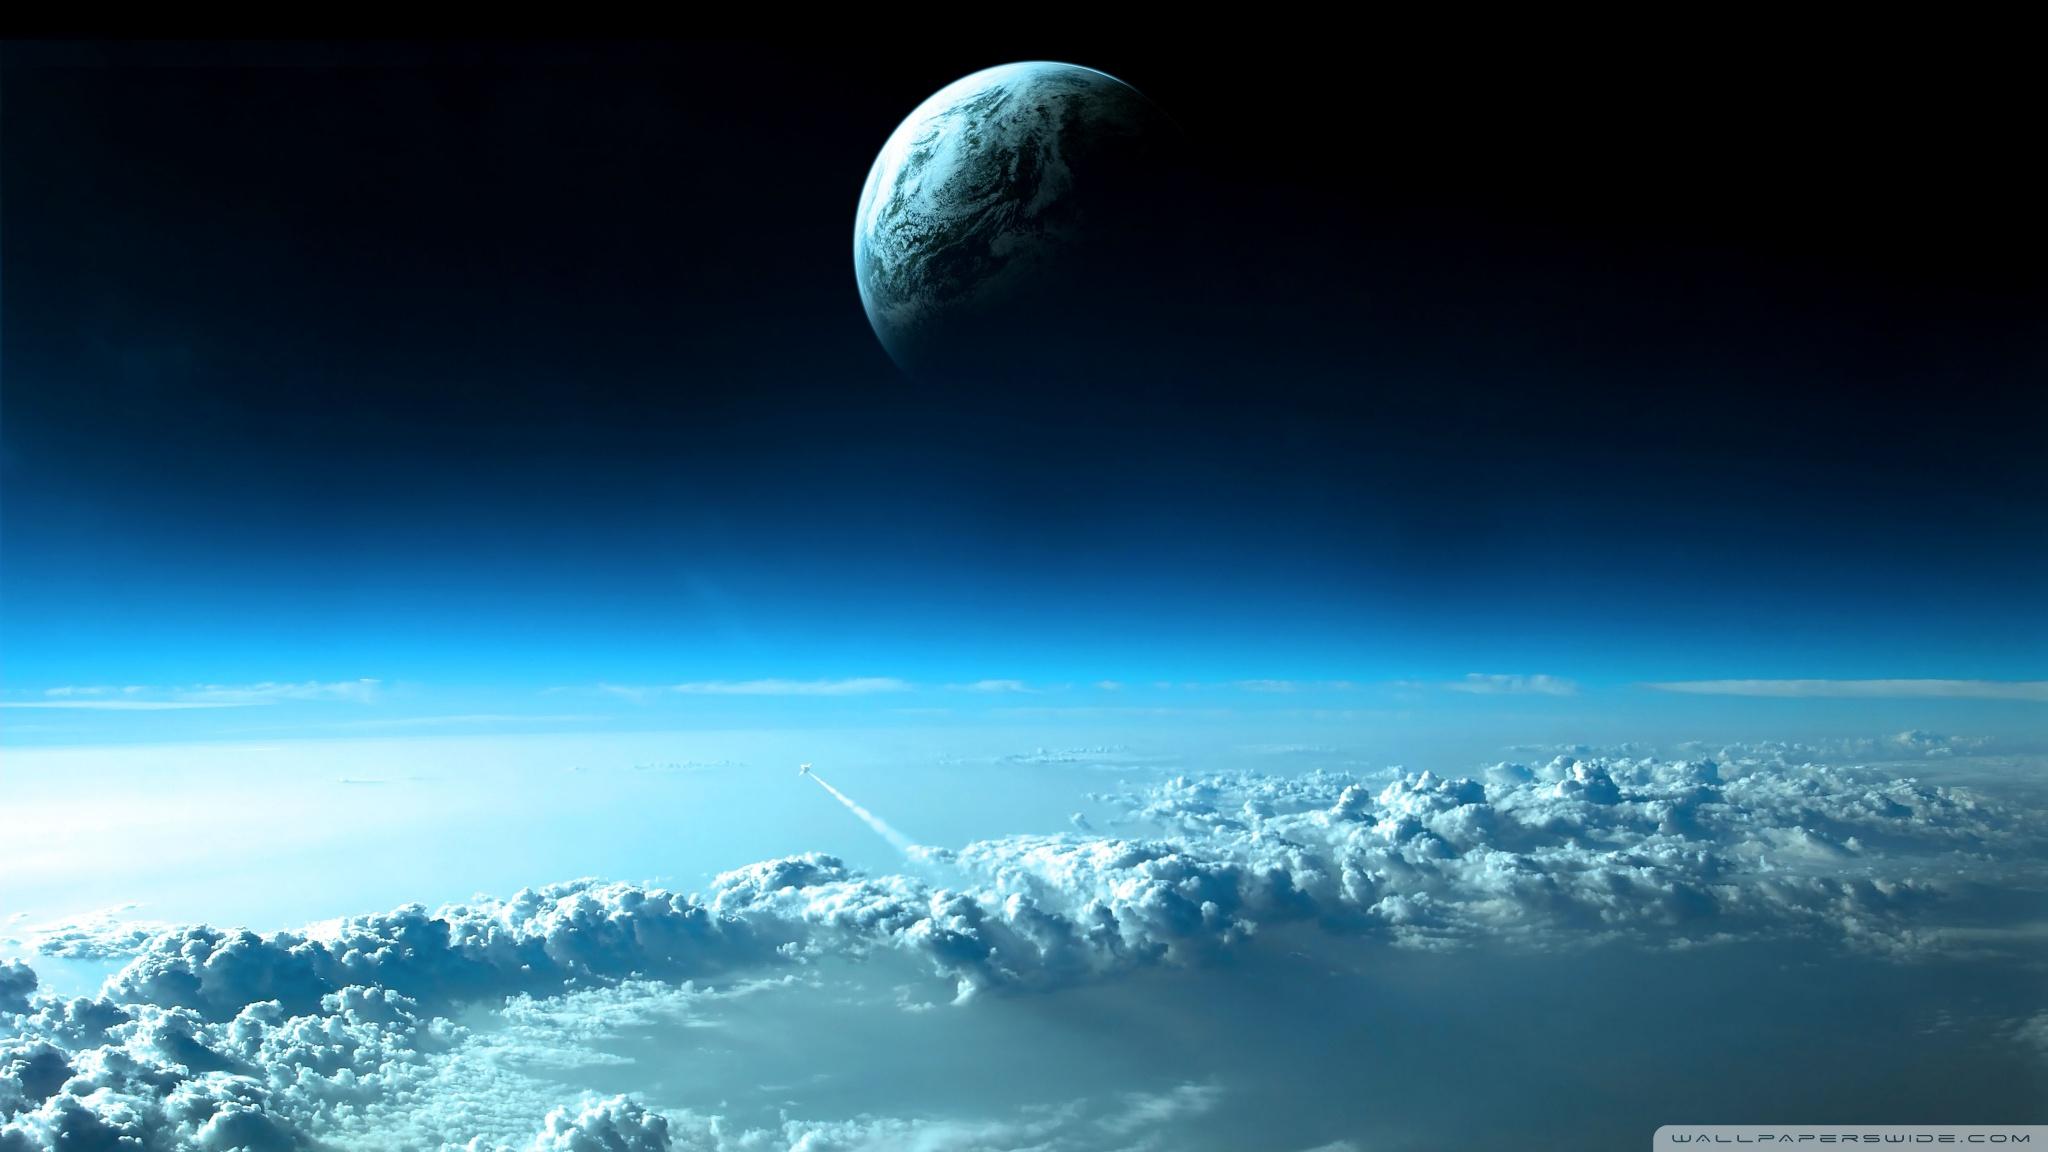 Beautiful Space View 4K HD Desktop Wallpaper For 4K Ultra